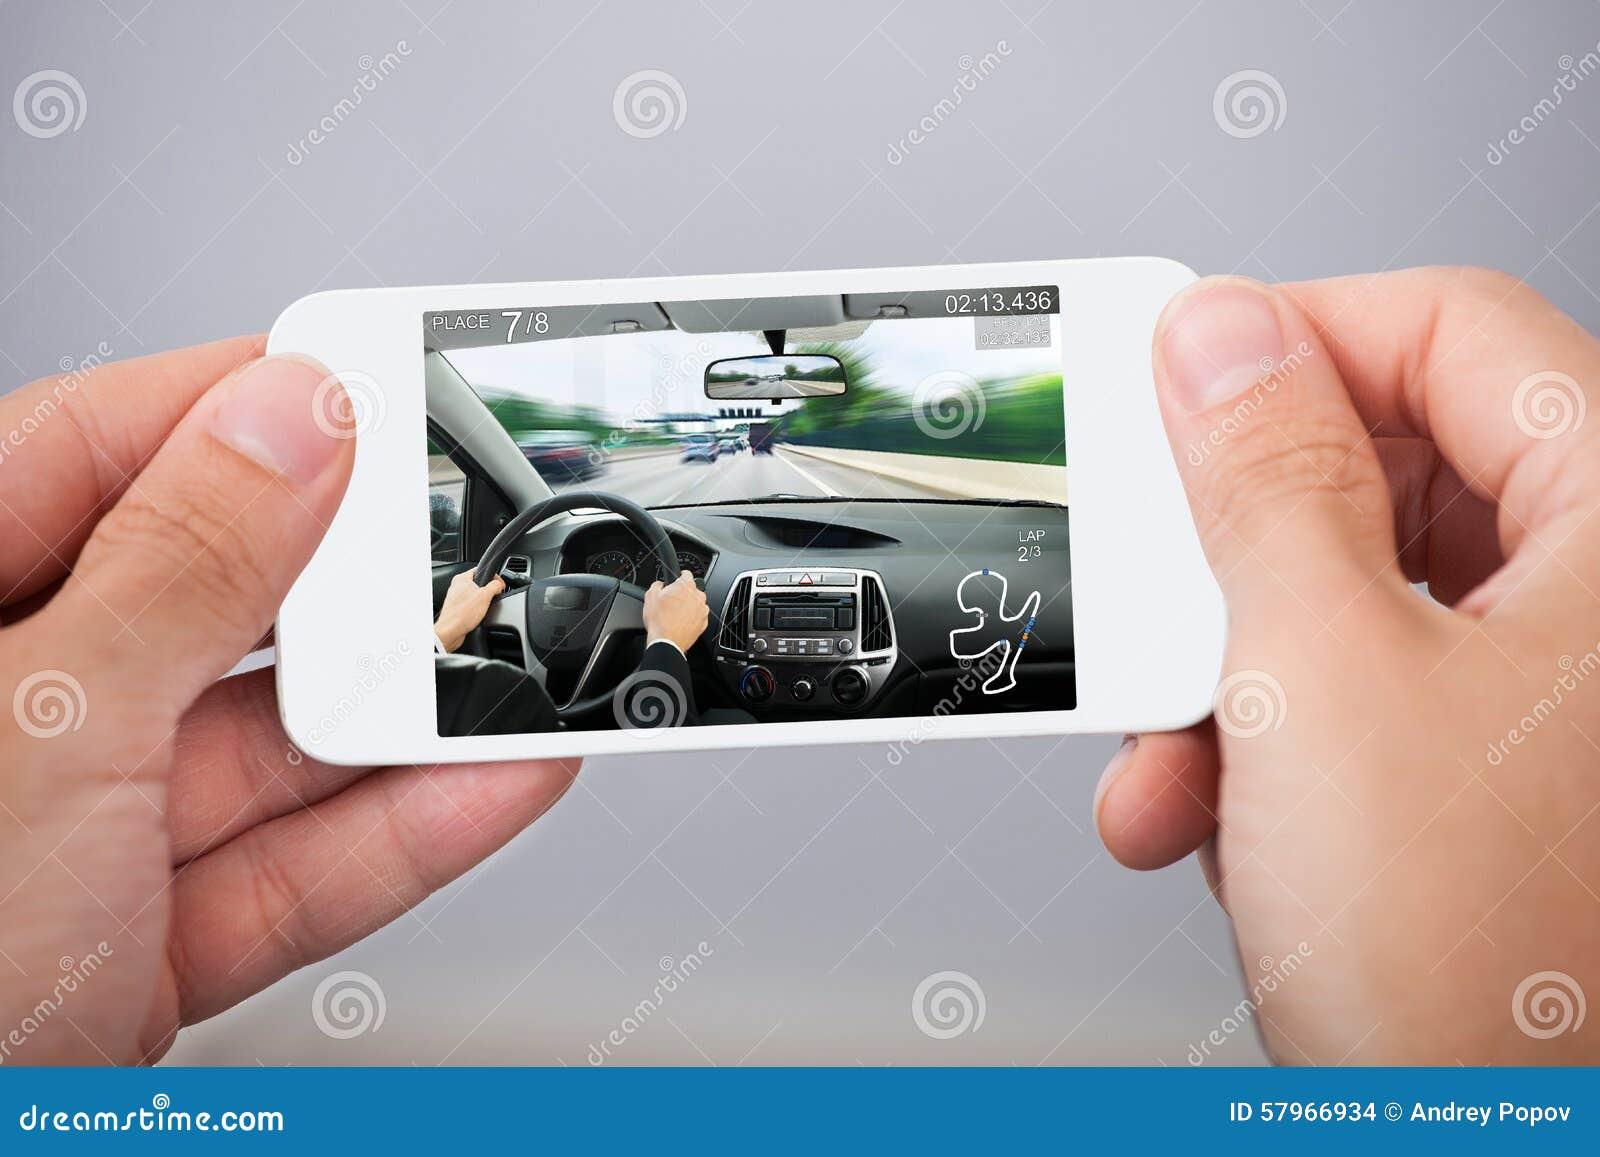 T Mobile Spiele